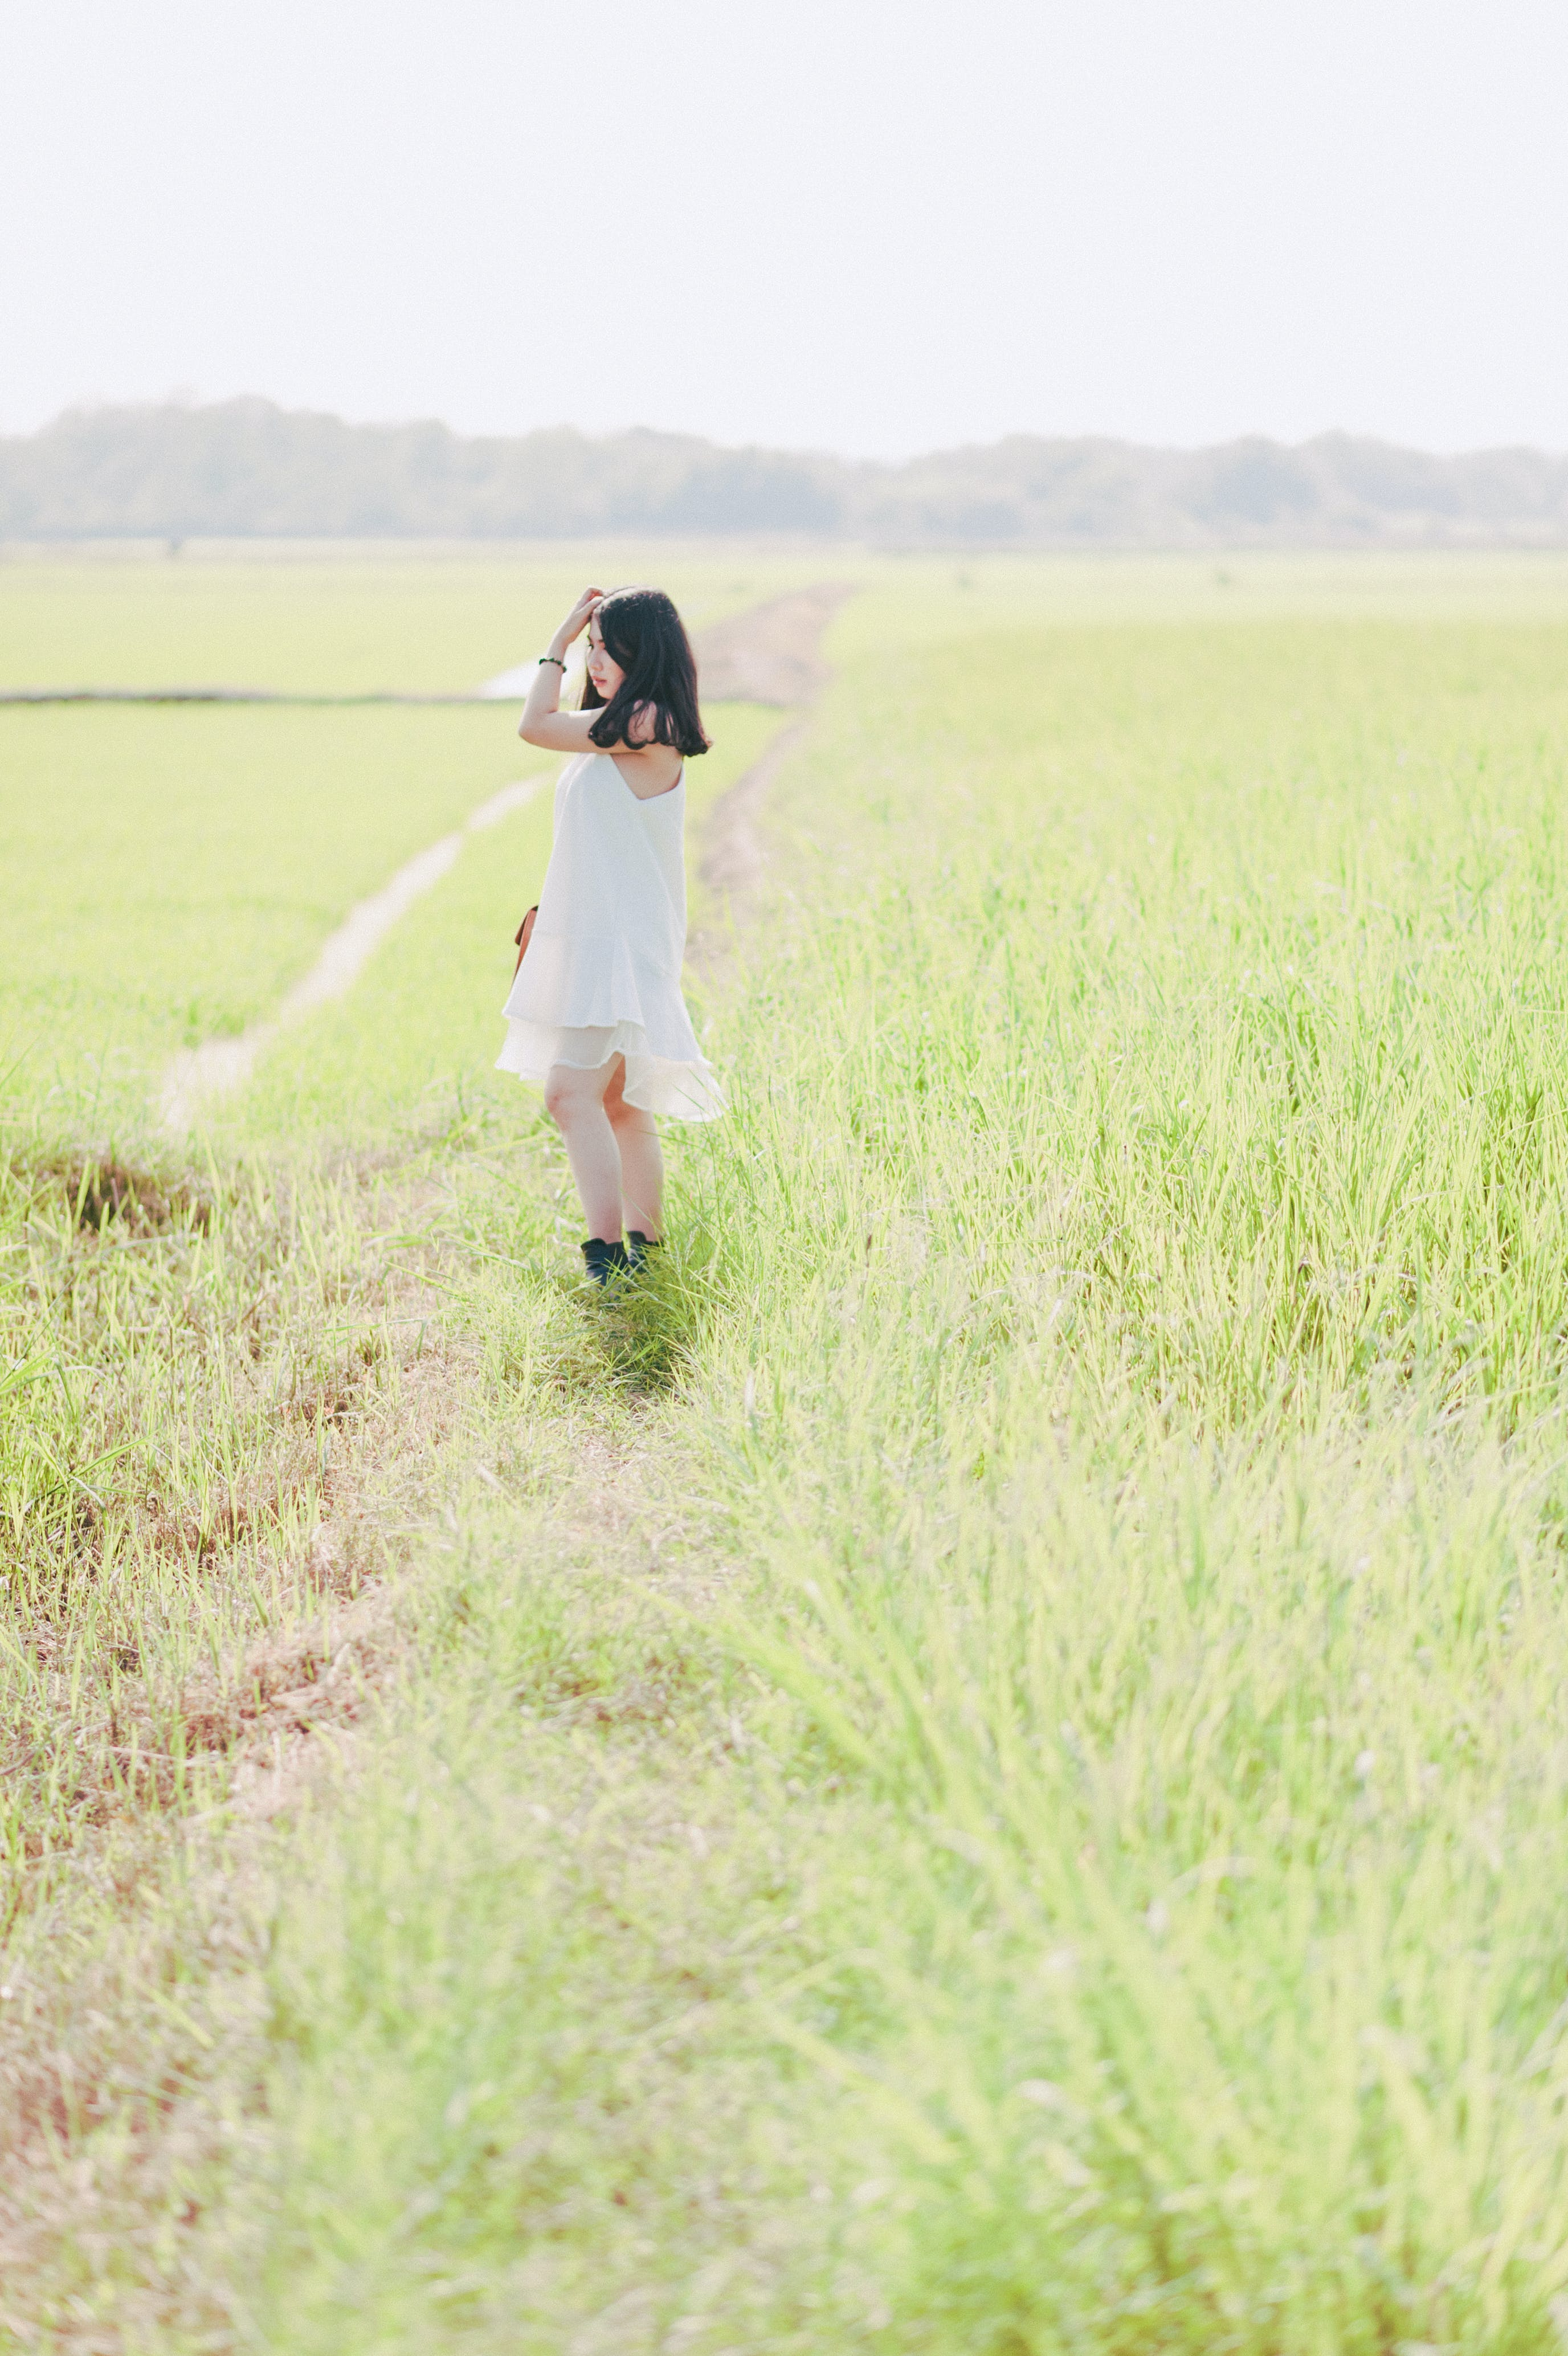 Kostnadsfri bild av åkermark, bete, bondgård, dagsljus